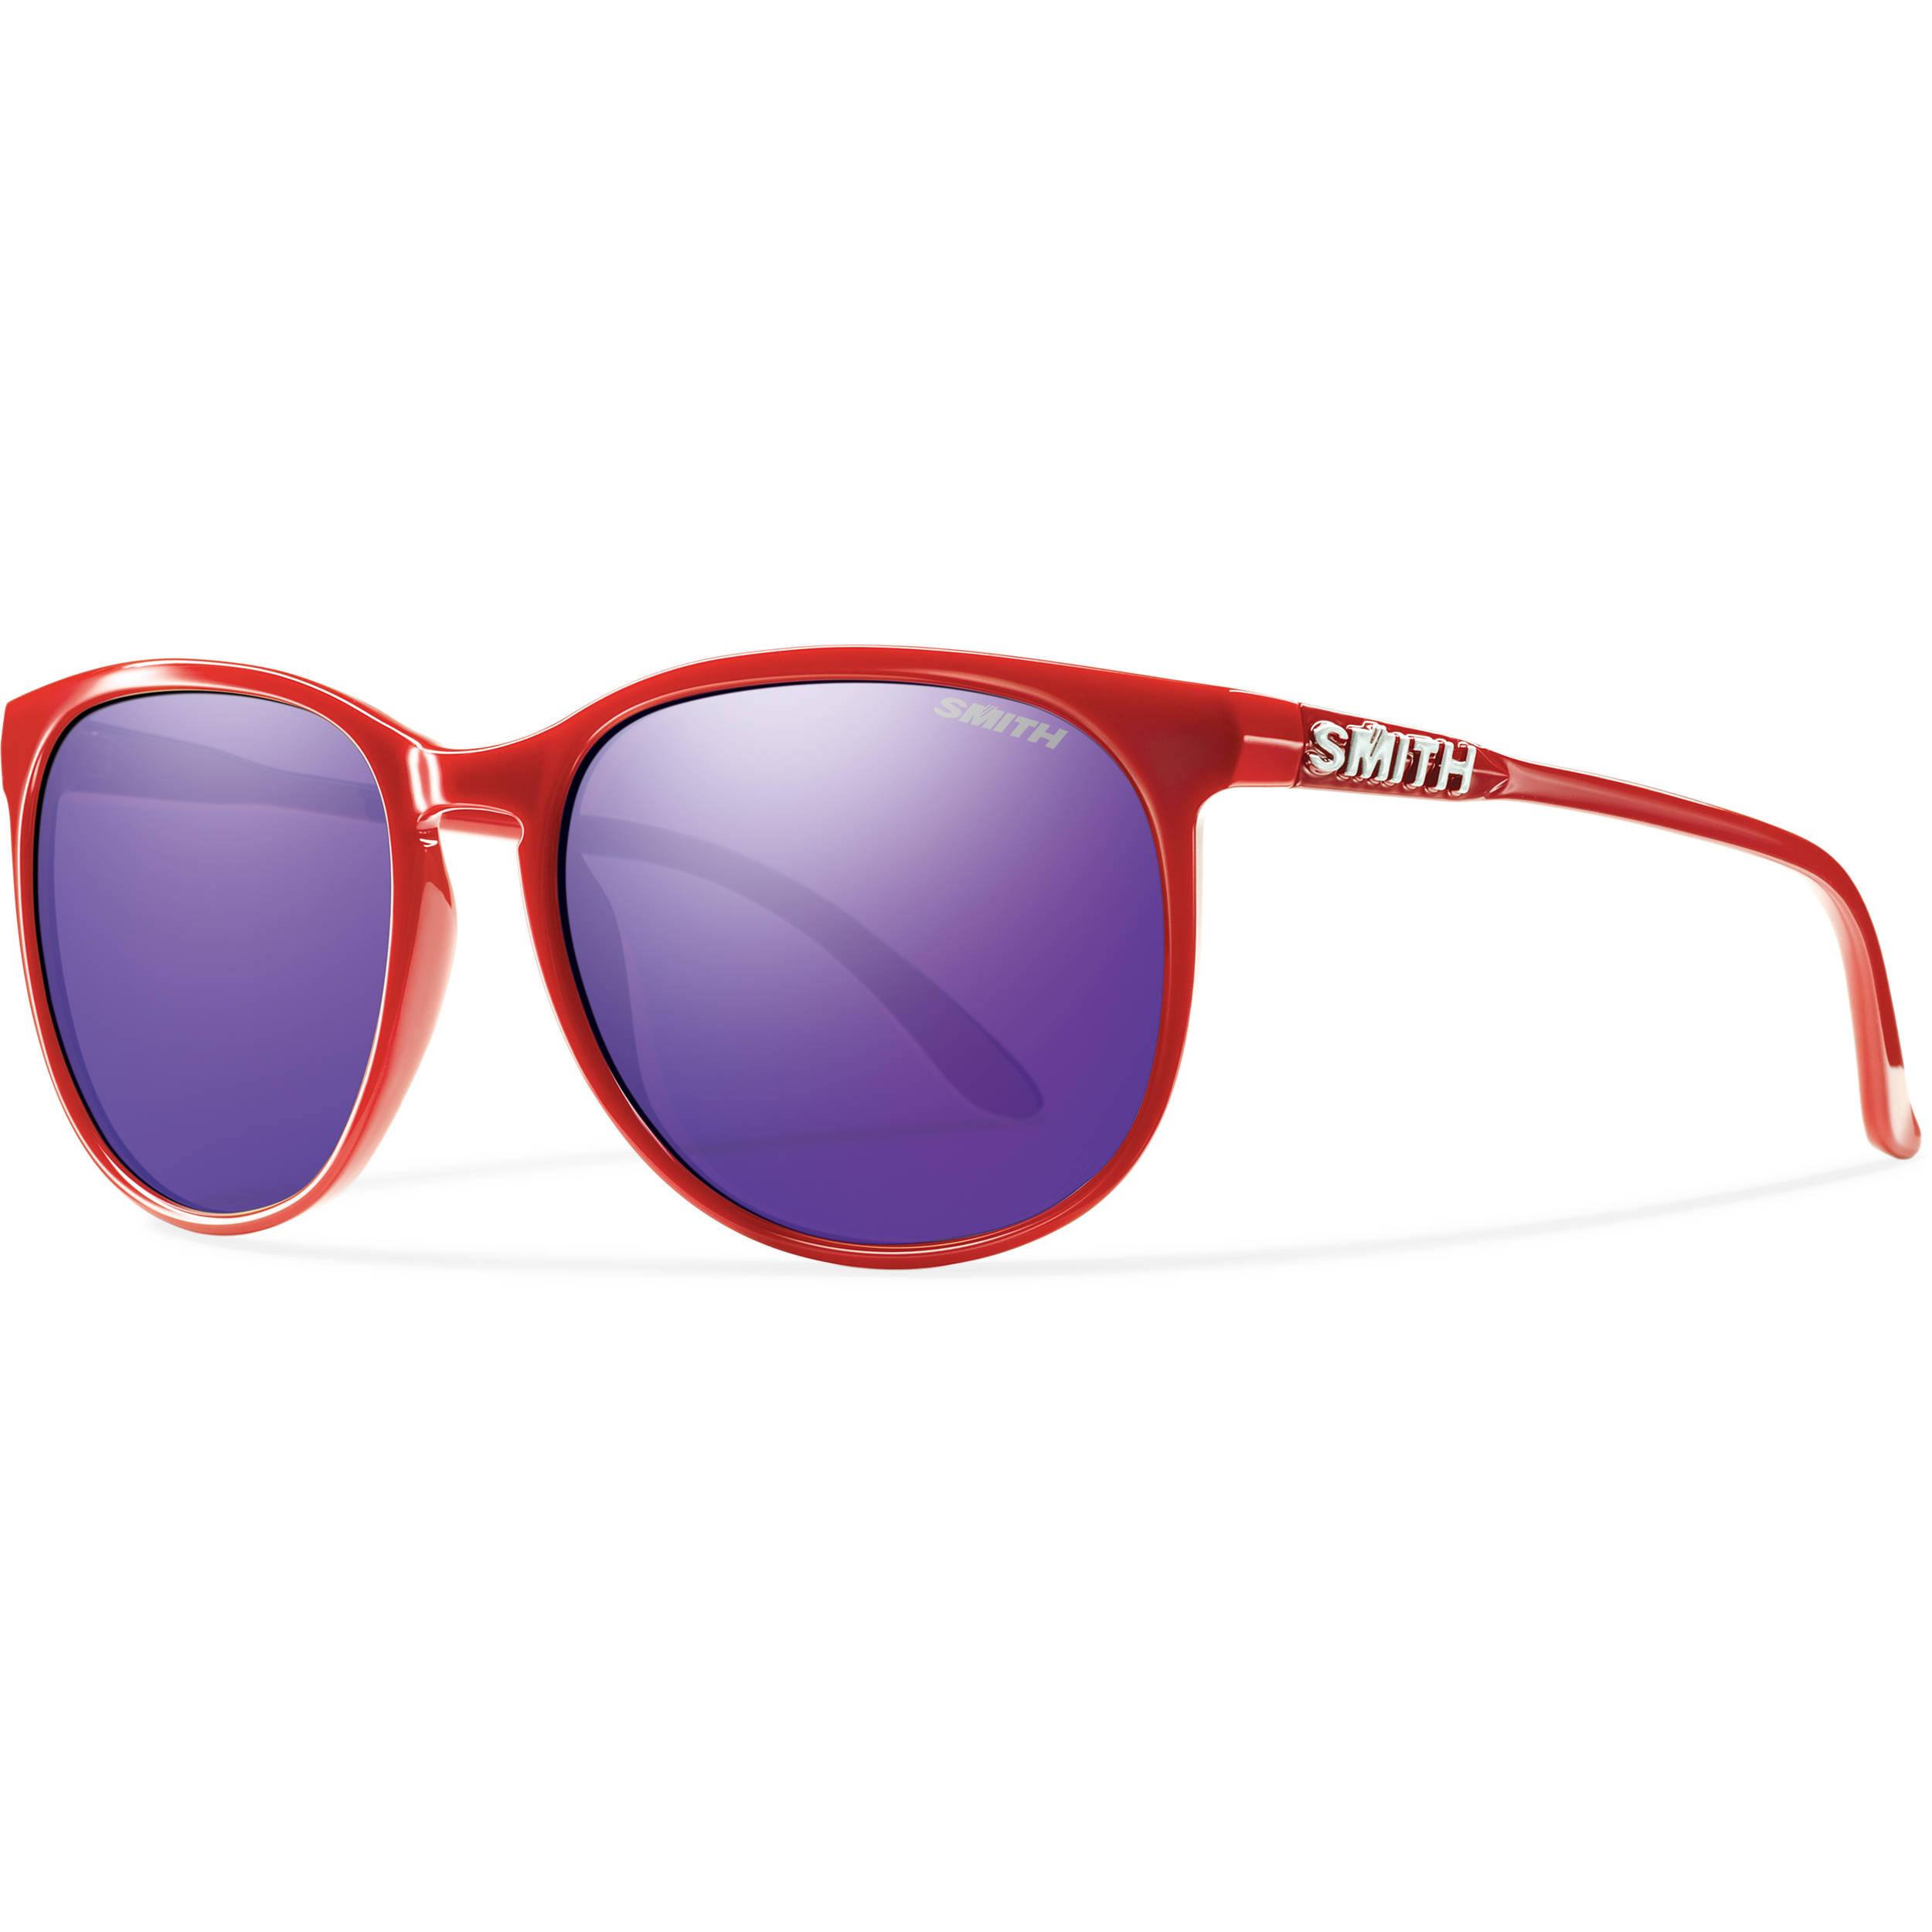 48b290f1e5 Smith Optics Mt Shasta Unisex Sunglasses (Red Frames   Purple Sol-X  Carbonic TLT Lenses)